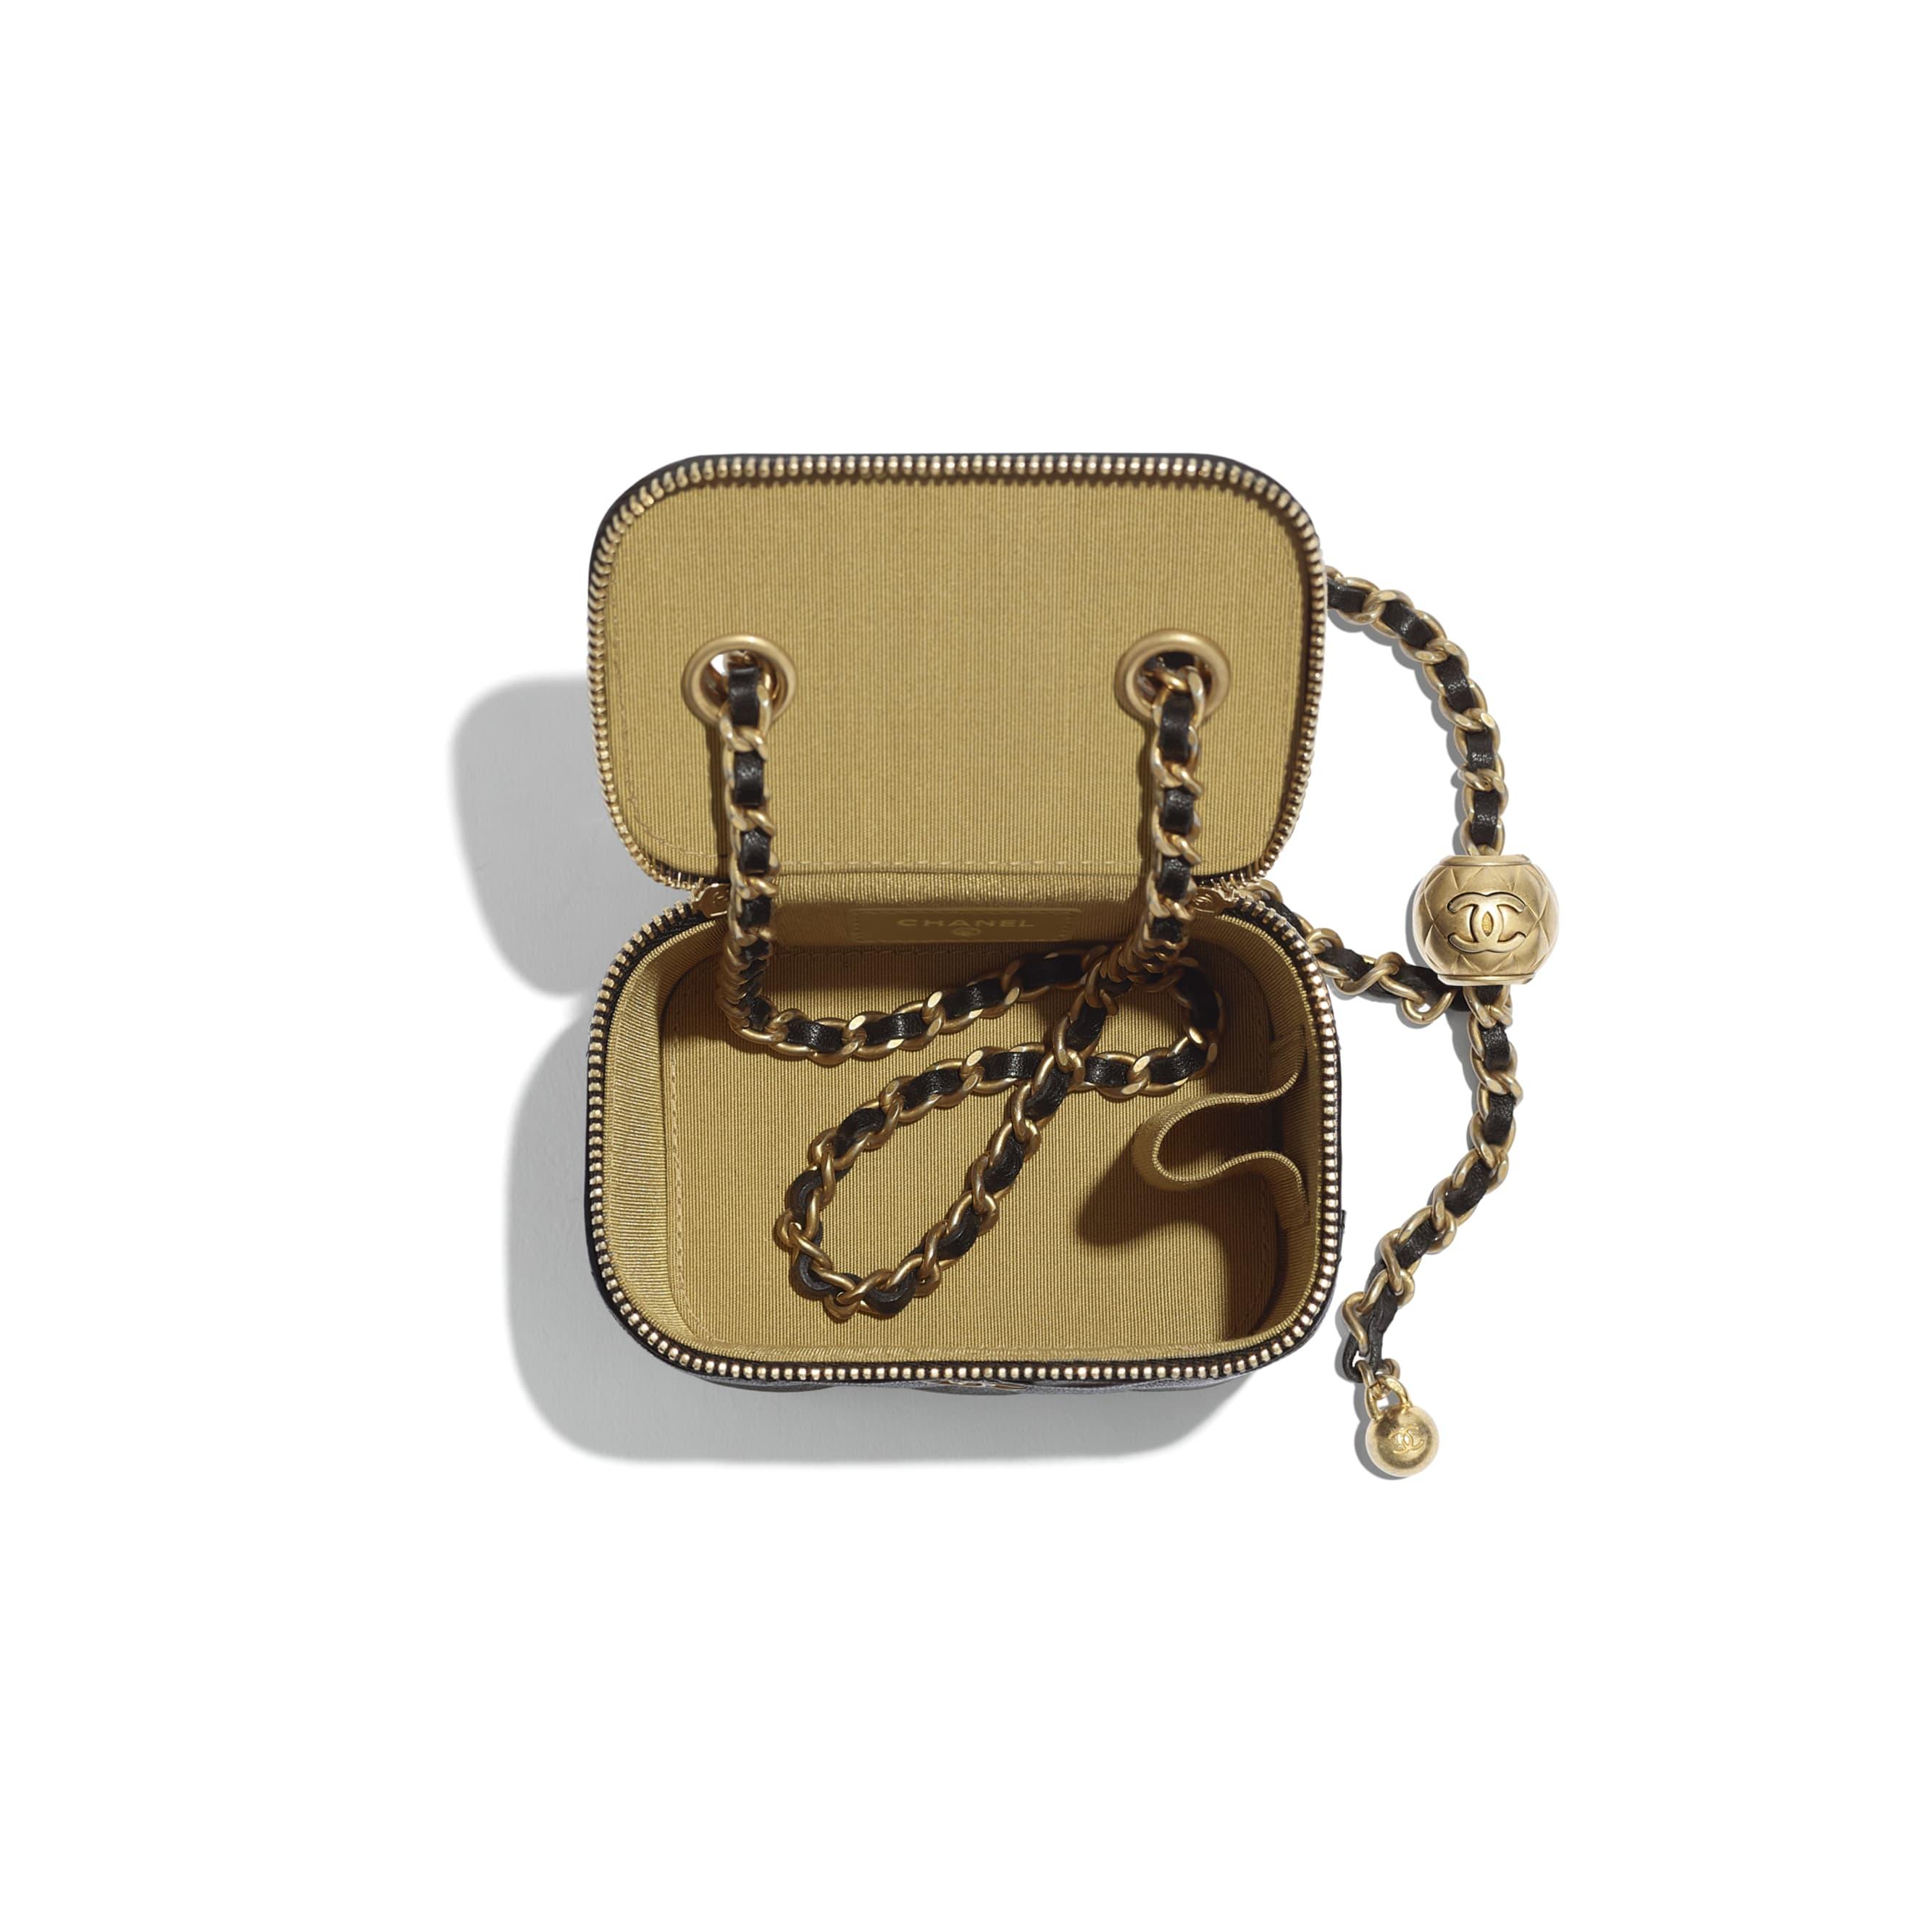 Small Classic Box with Chain - 黑 - 小羊皮與金色金屬 - 其他視圖 - 查看標準尺寸版本